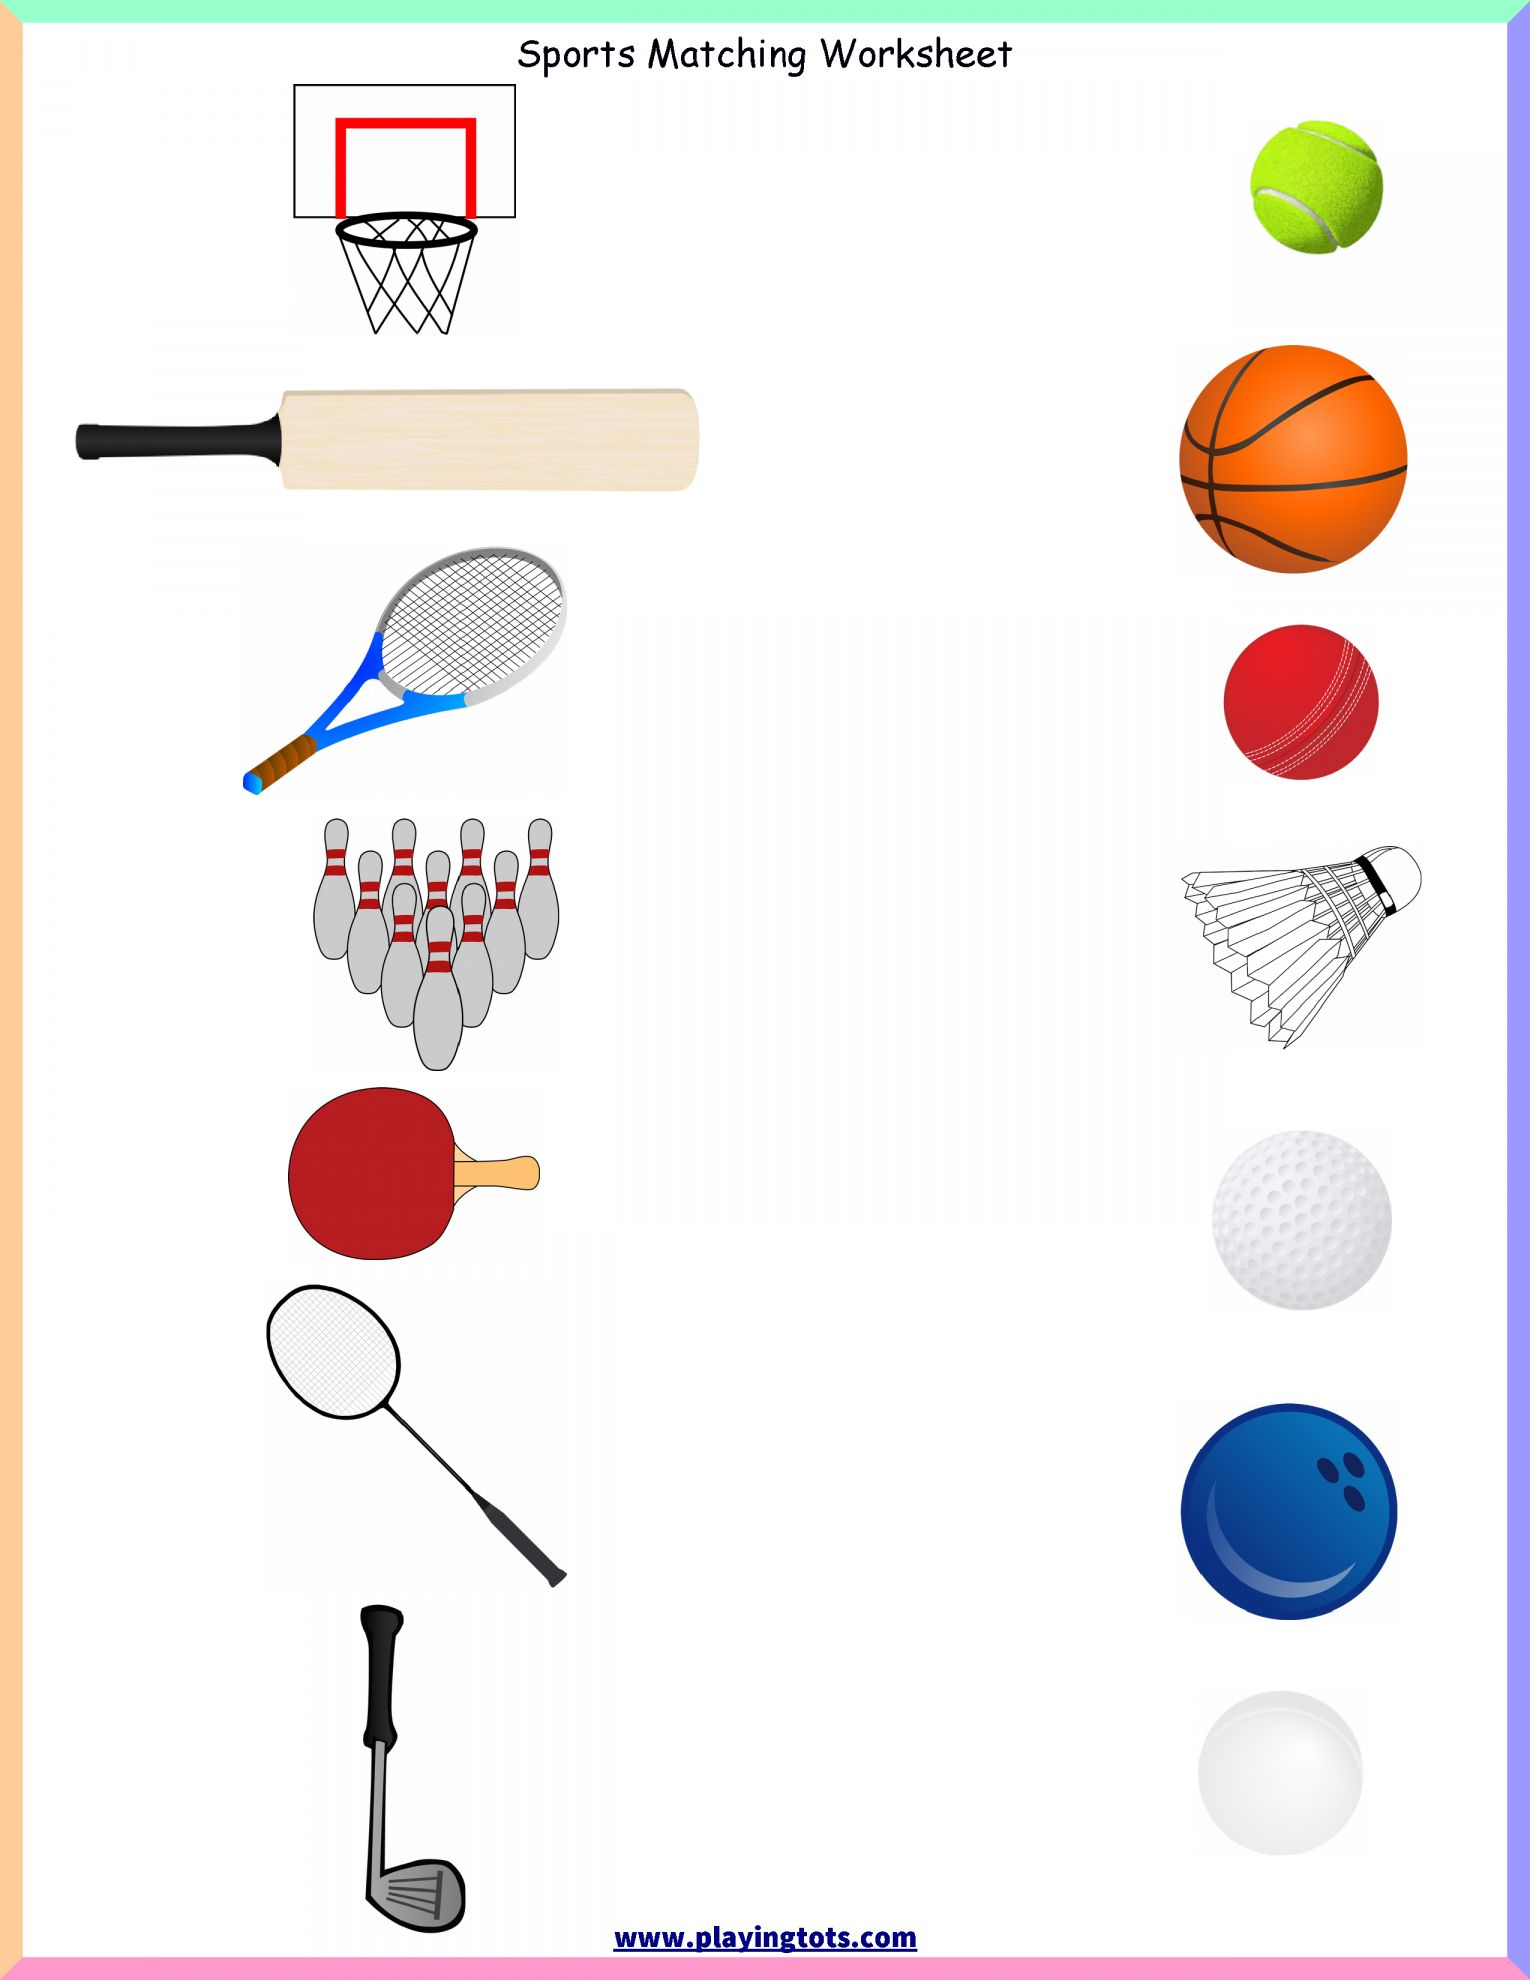 Preschool Worksheet For Ball Study And Keywords Matching